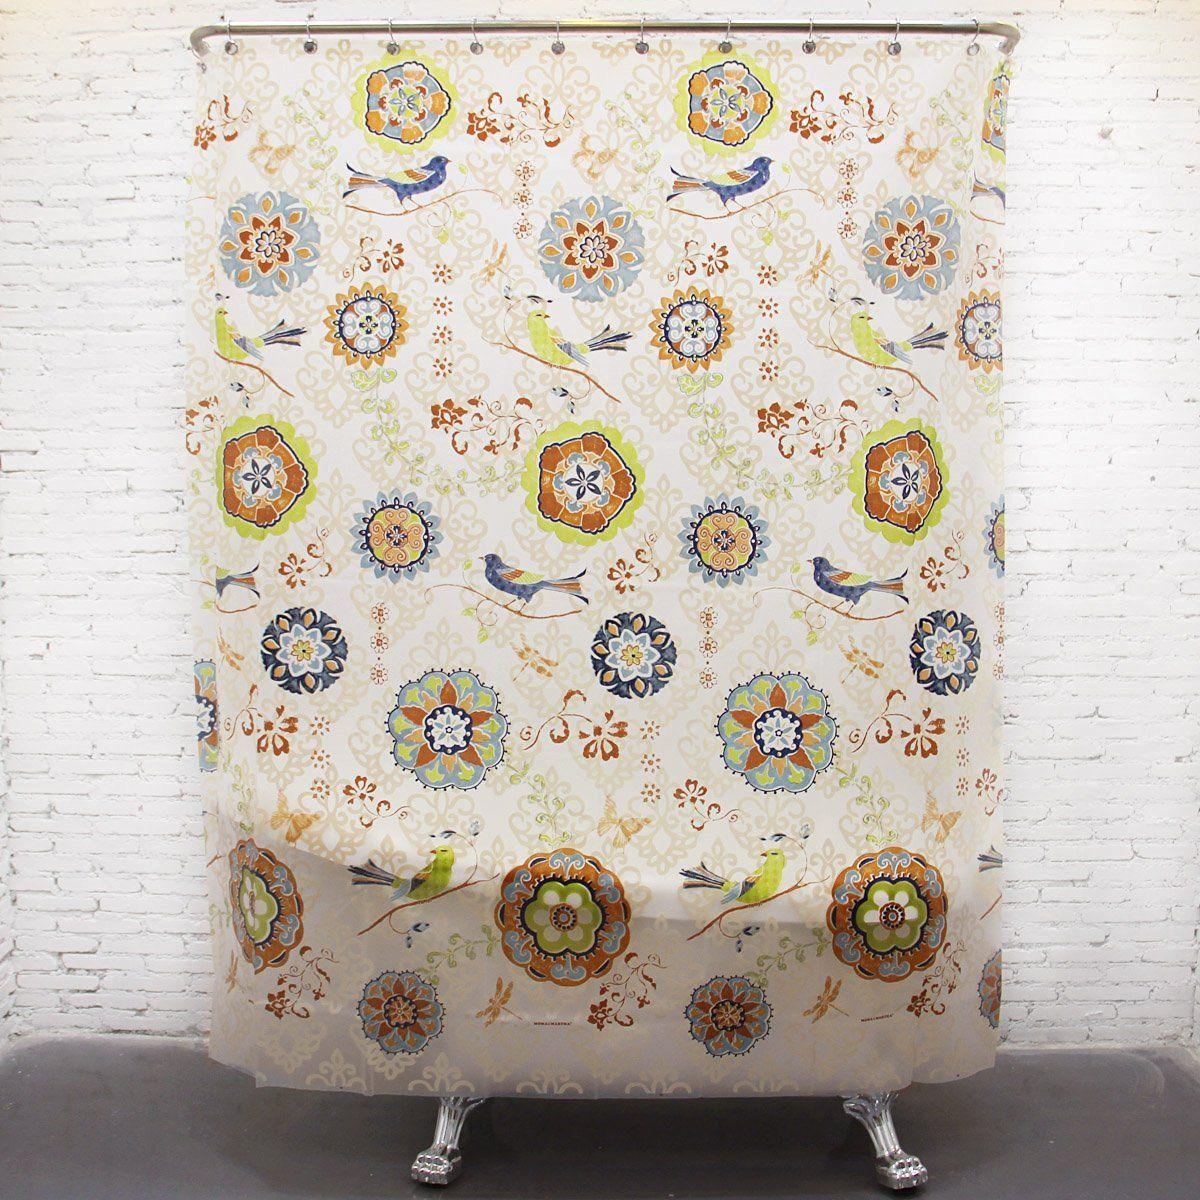 Riverbyland Shower Curtains Birds 72 X 80